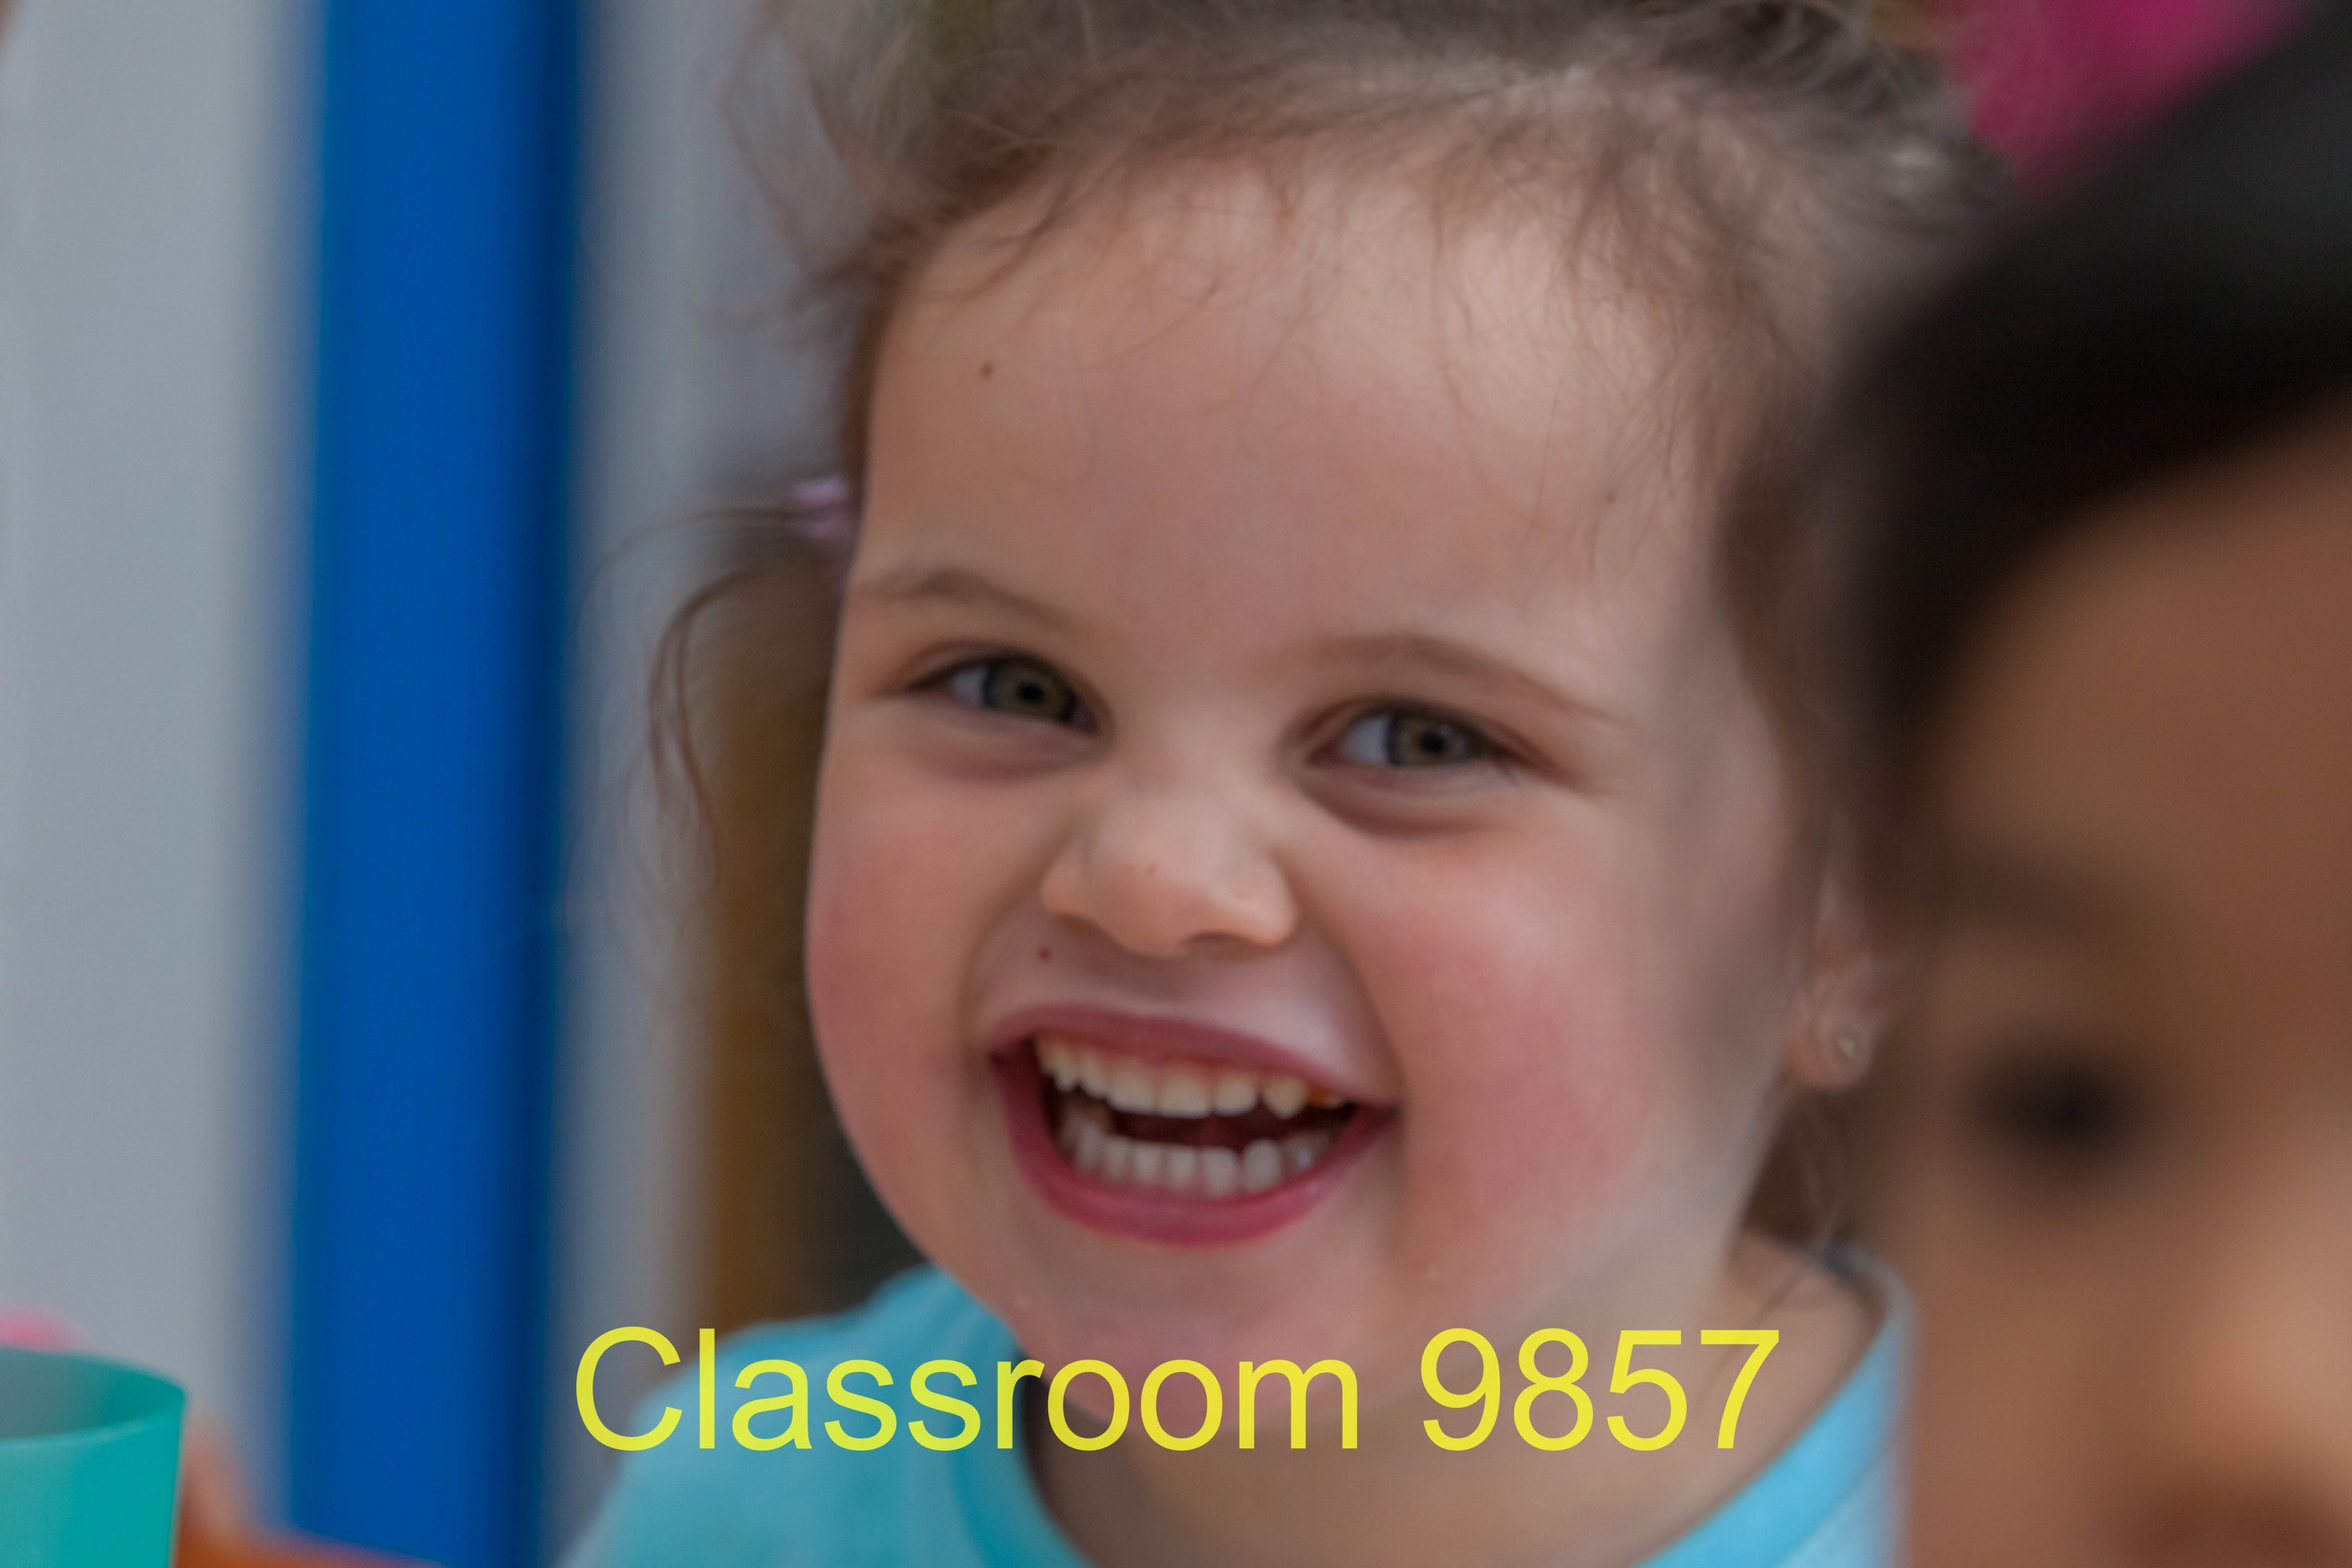 Classroom 9857